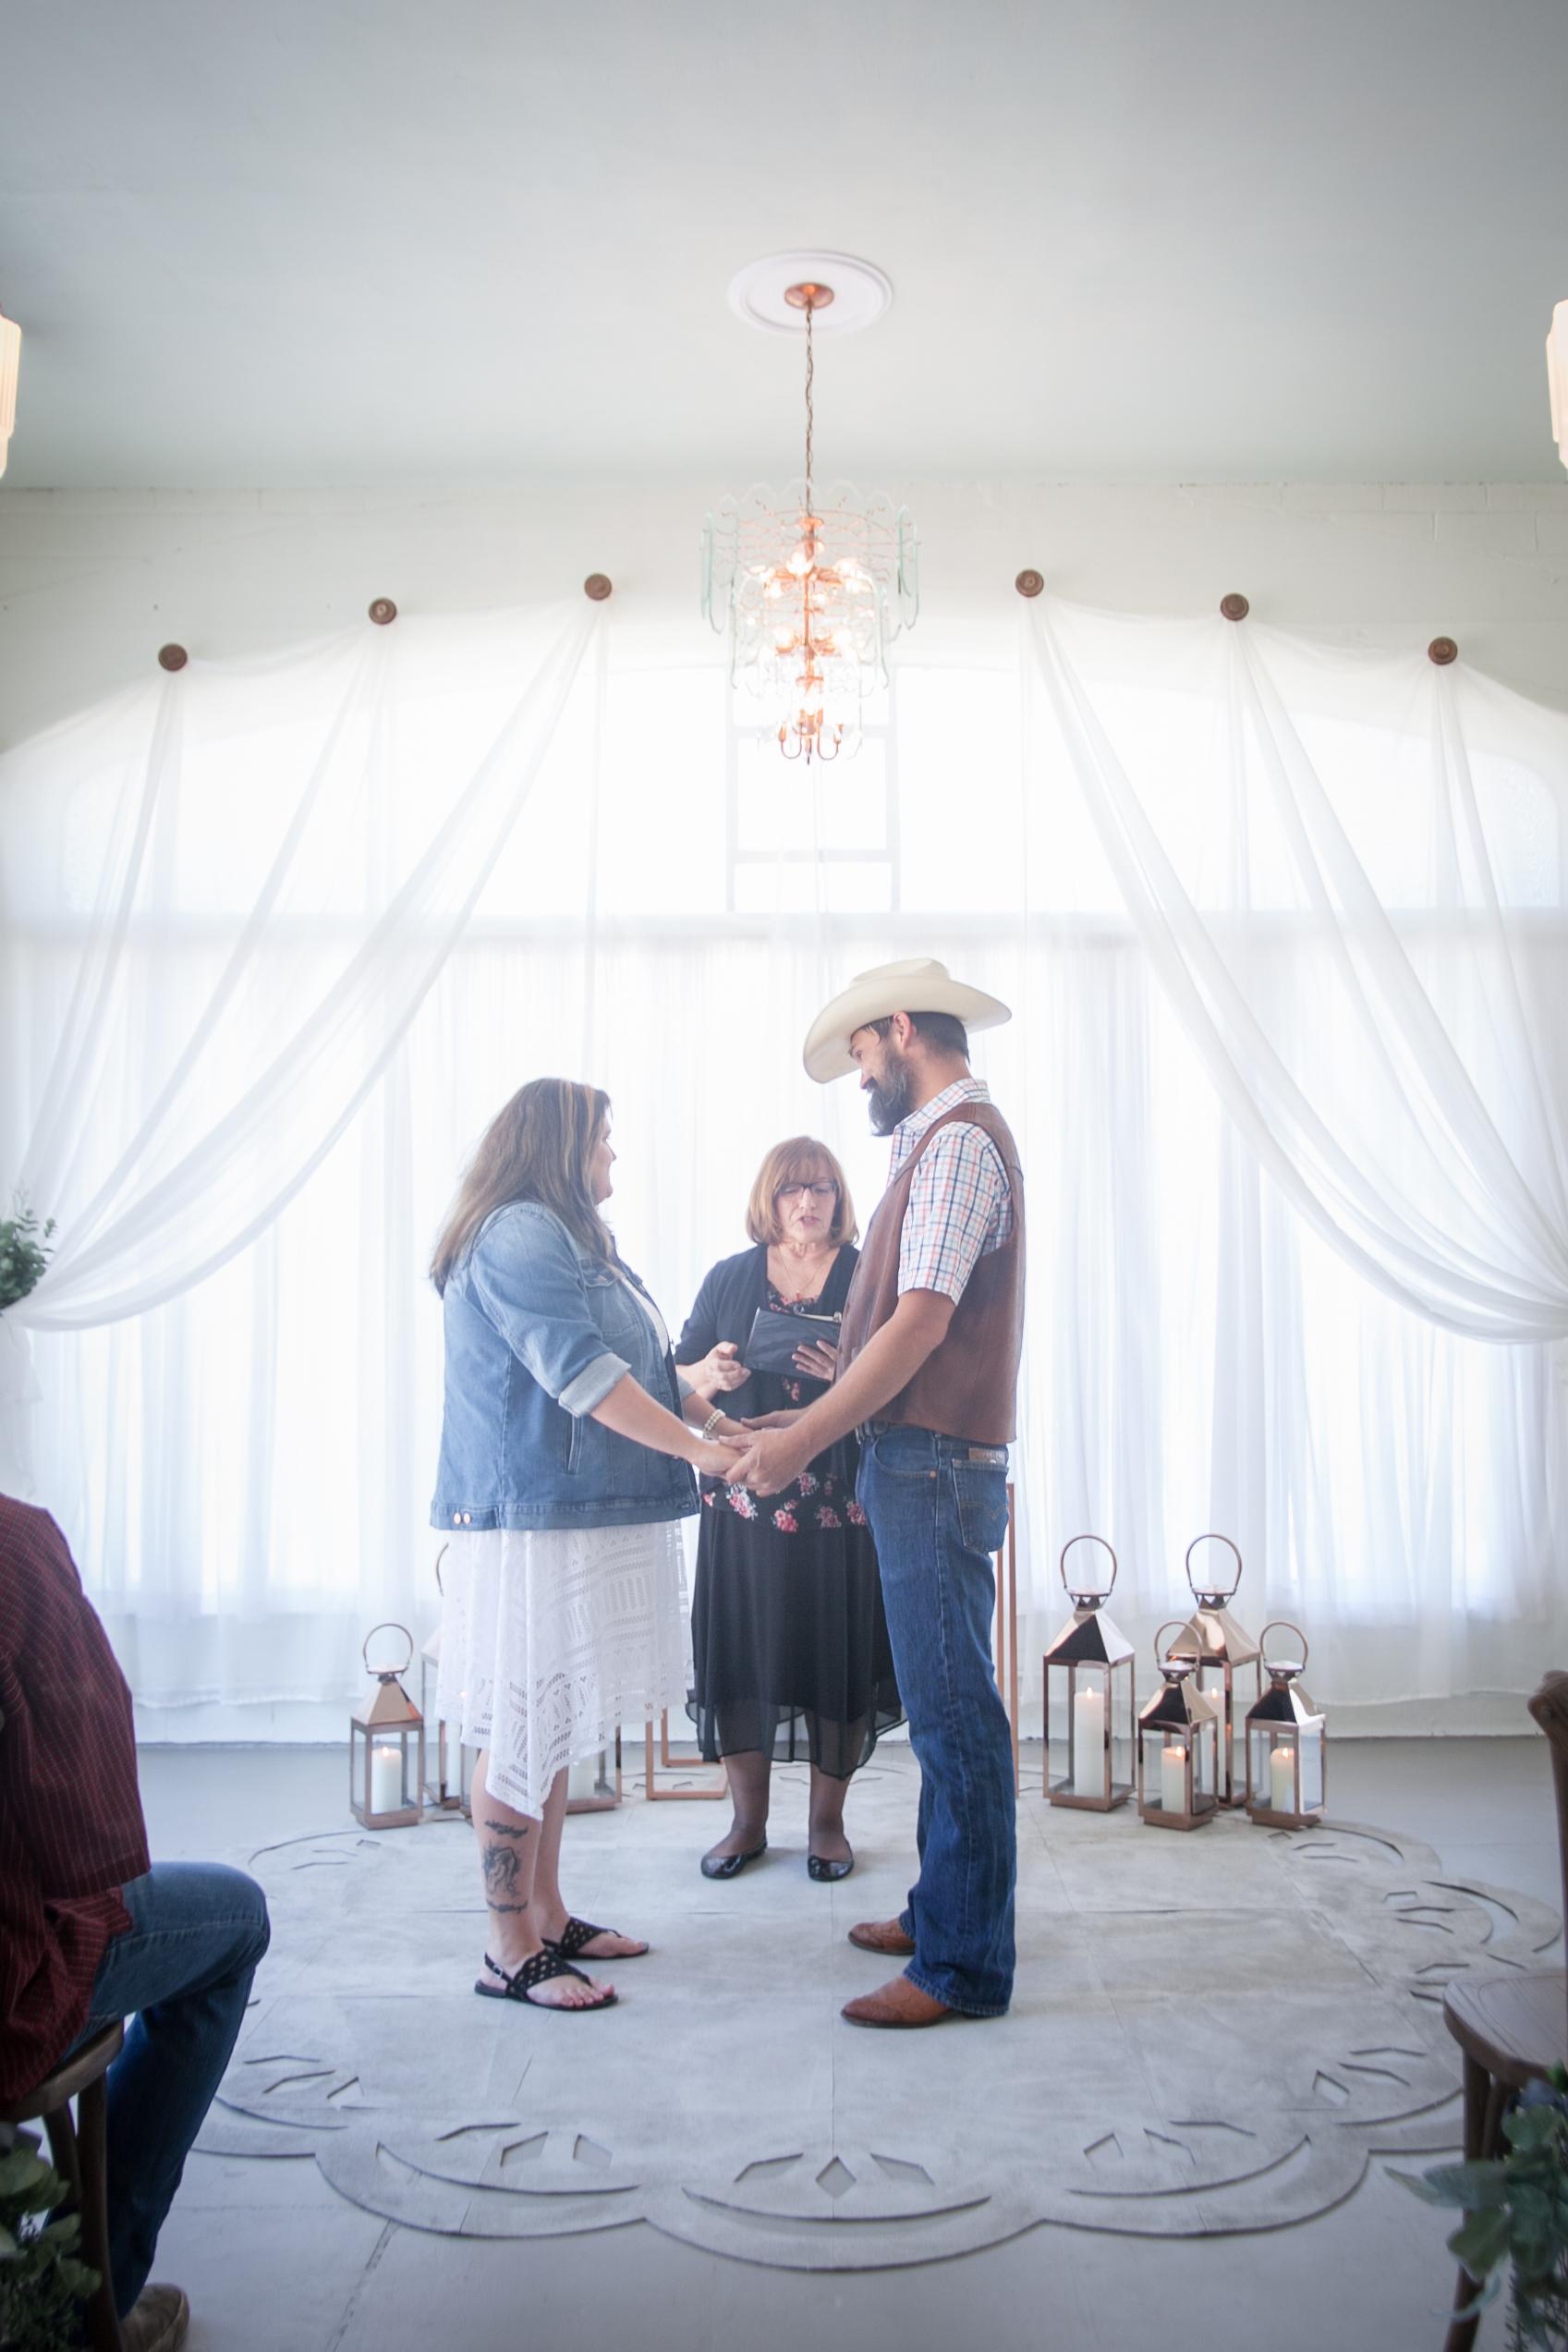 Kansas_City_Small_Wedding_Venue_Elope_Intimate_Ceremony_Budget_Affordable_Wedding Day-17.jpg